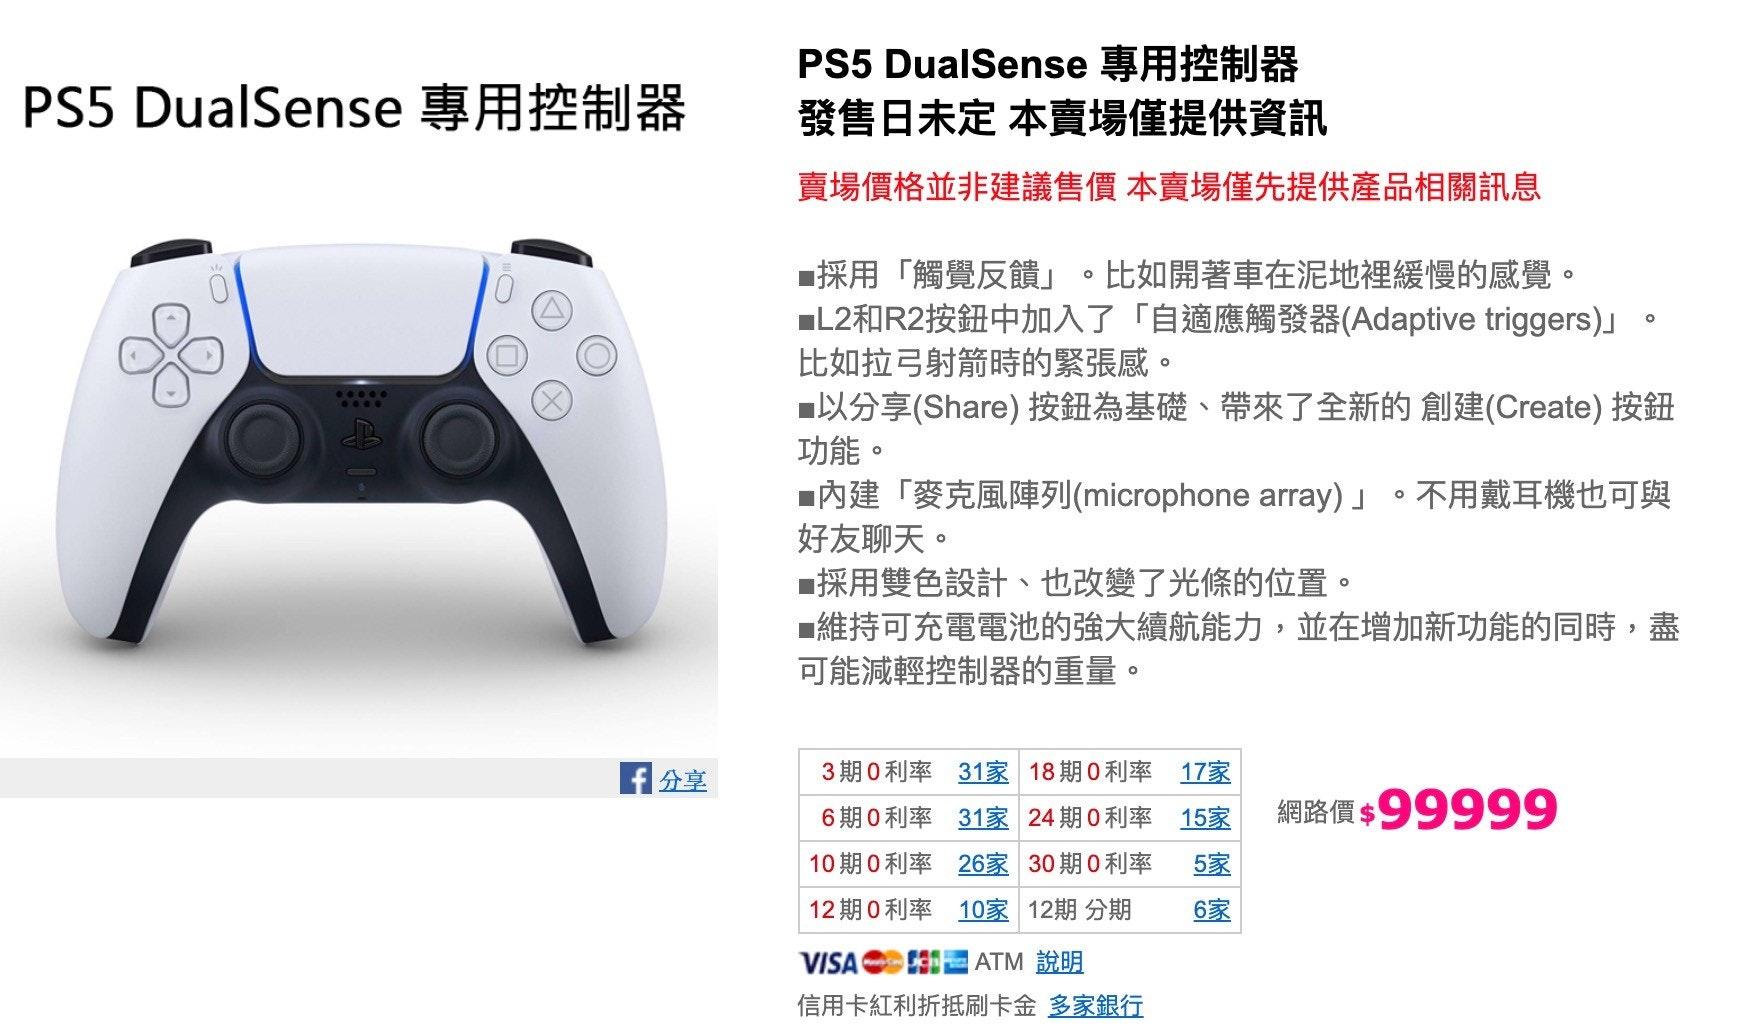 照片中提到了PS5 DualSense 專用控制器、PS5 DualSense 專用控制器、發售日未定本賣場僅提供資訊,包含了ps5 c、的PlayStation 5、USB-C、的PlayStation 4、麥克風